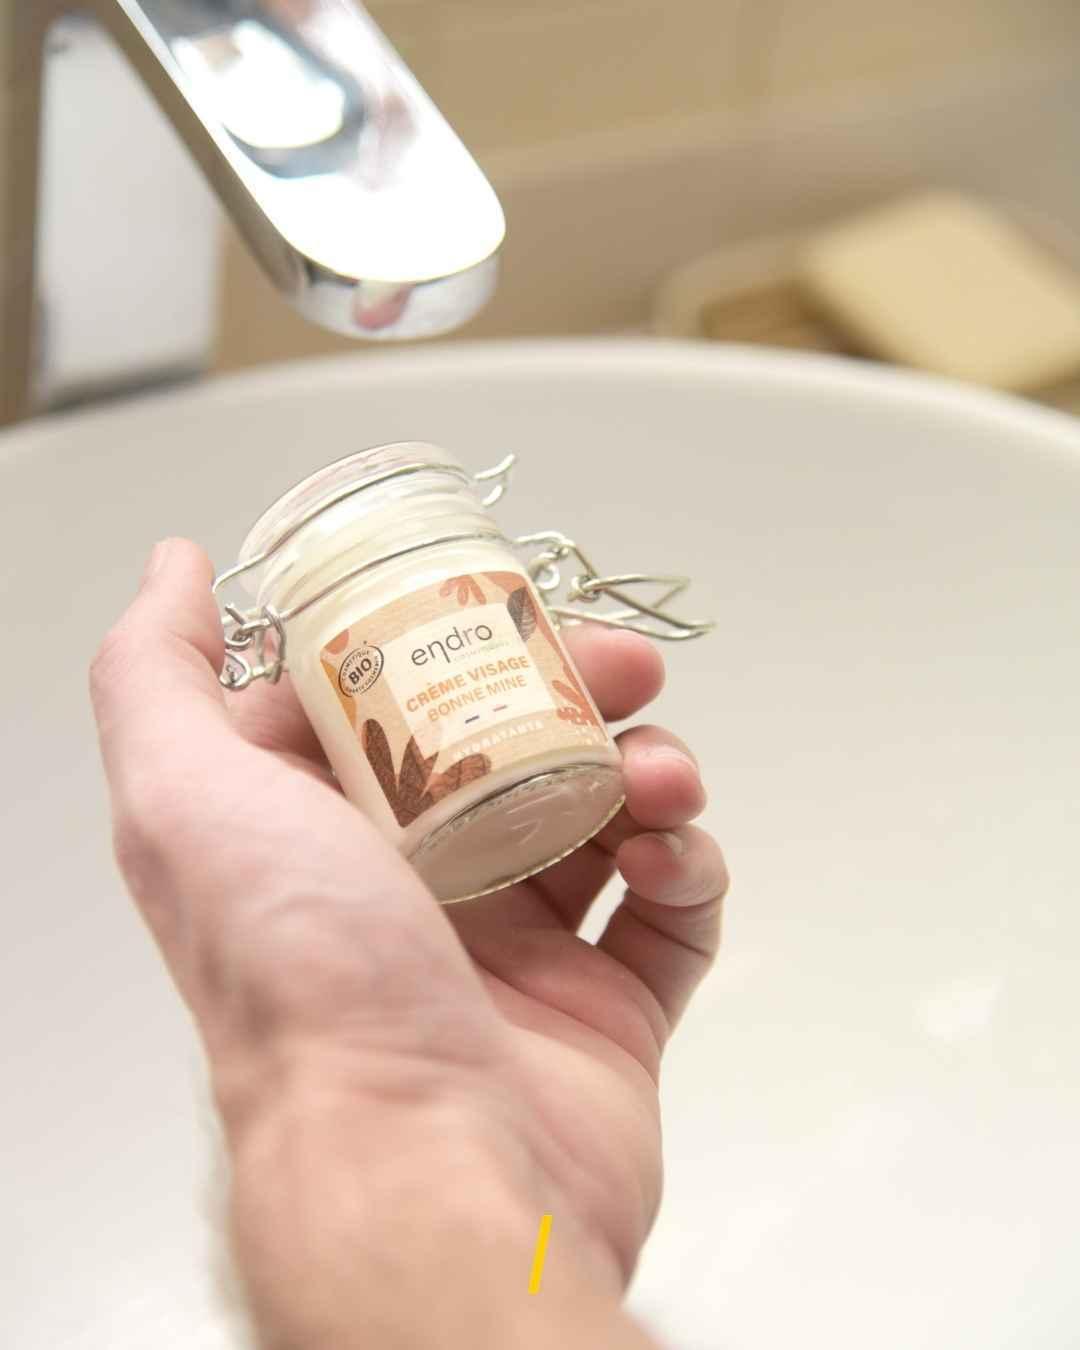 Crème visage hydratante bio - bonne mine - carotte - Endro - The Trust Society